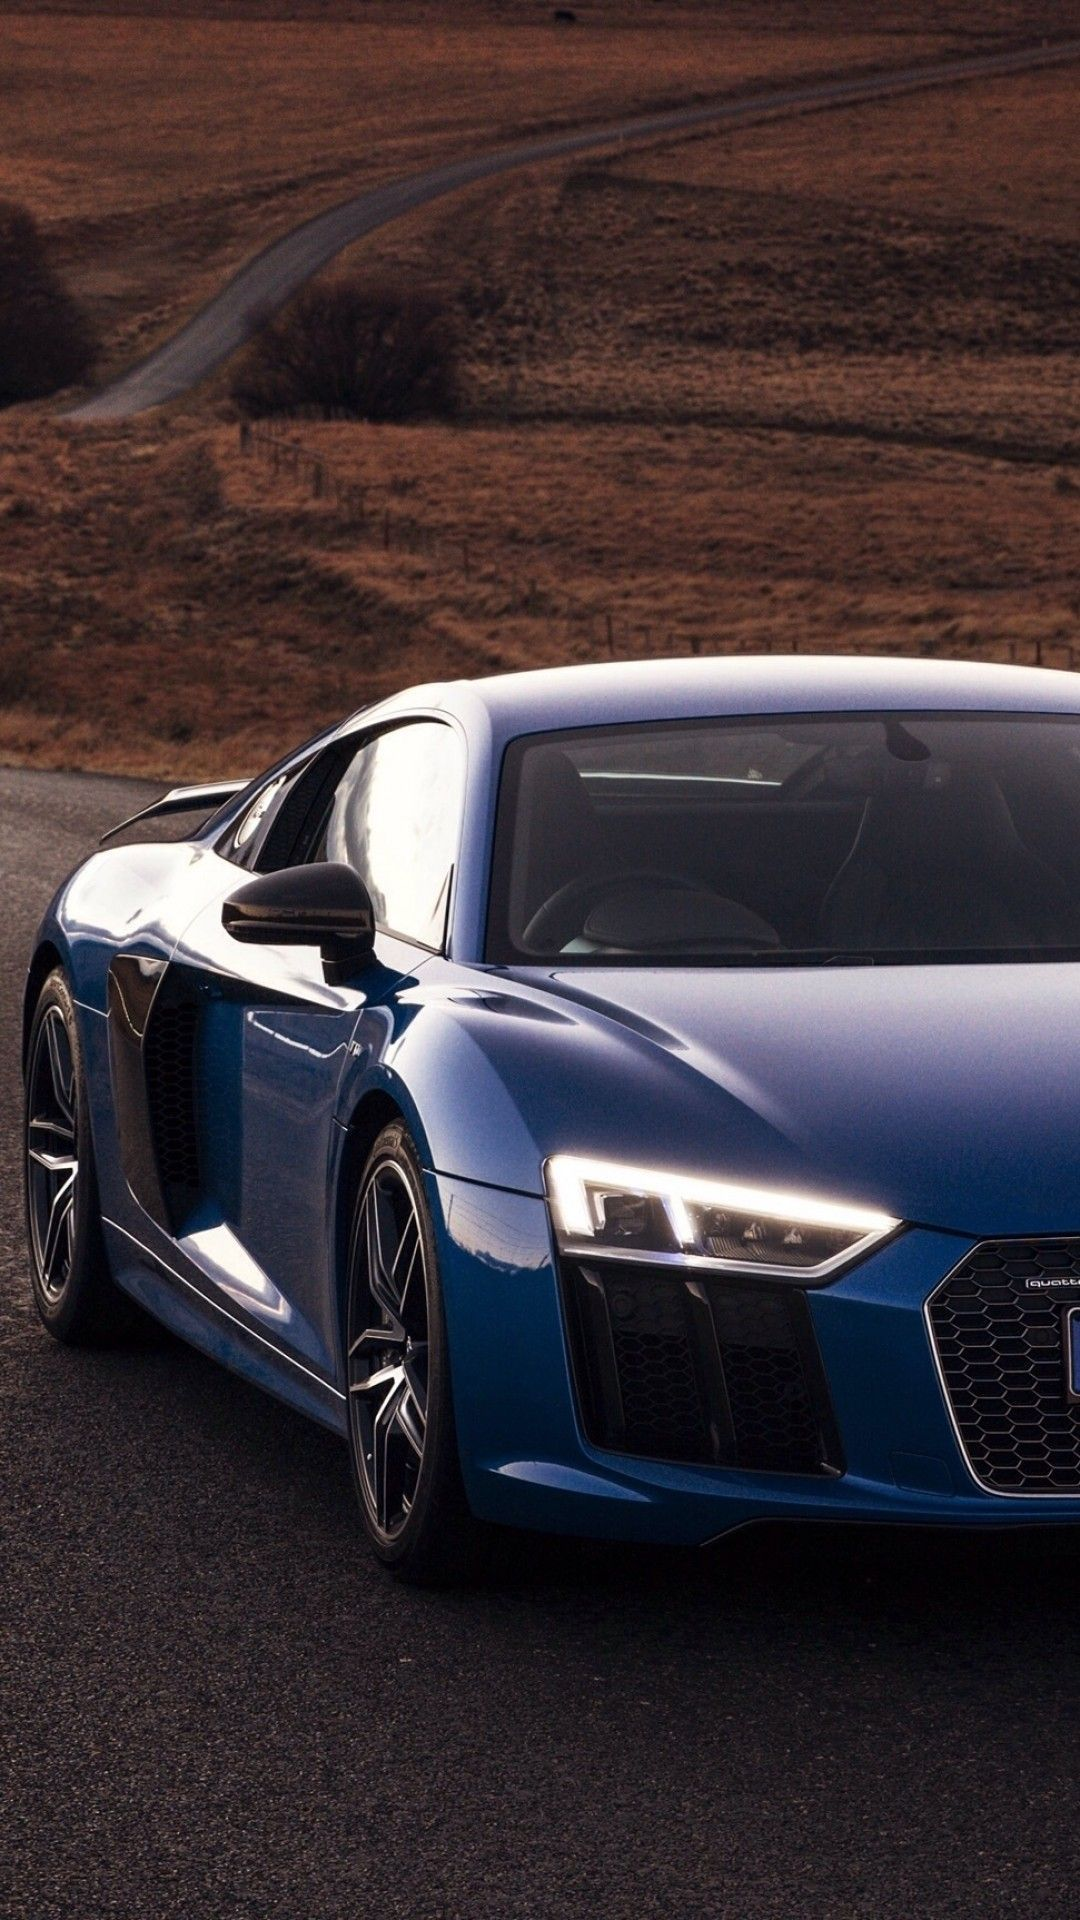 1080x1920 Wallpaper Audi R8 Iphone Wallpaper Audi R8 Iphone Wallpaper Audi Audi R8 Best Luxury Cars